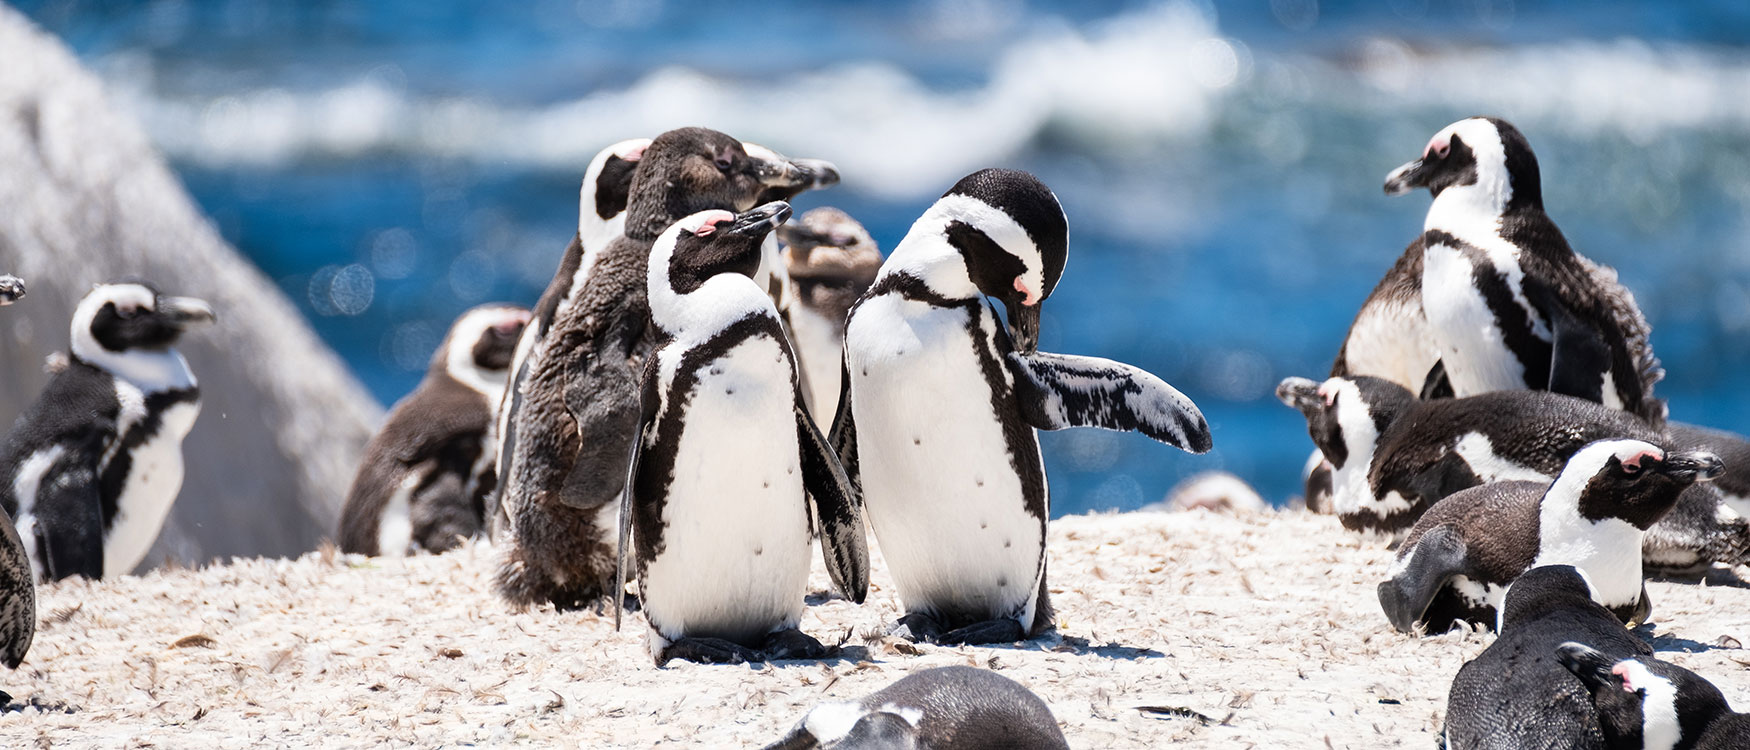 Kaphalbinsel Sehenswüridkgeiten Pinguine